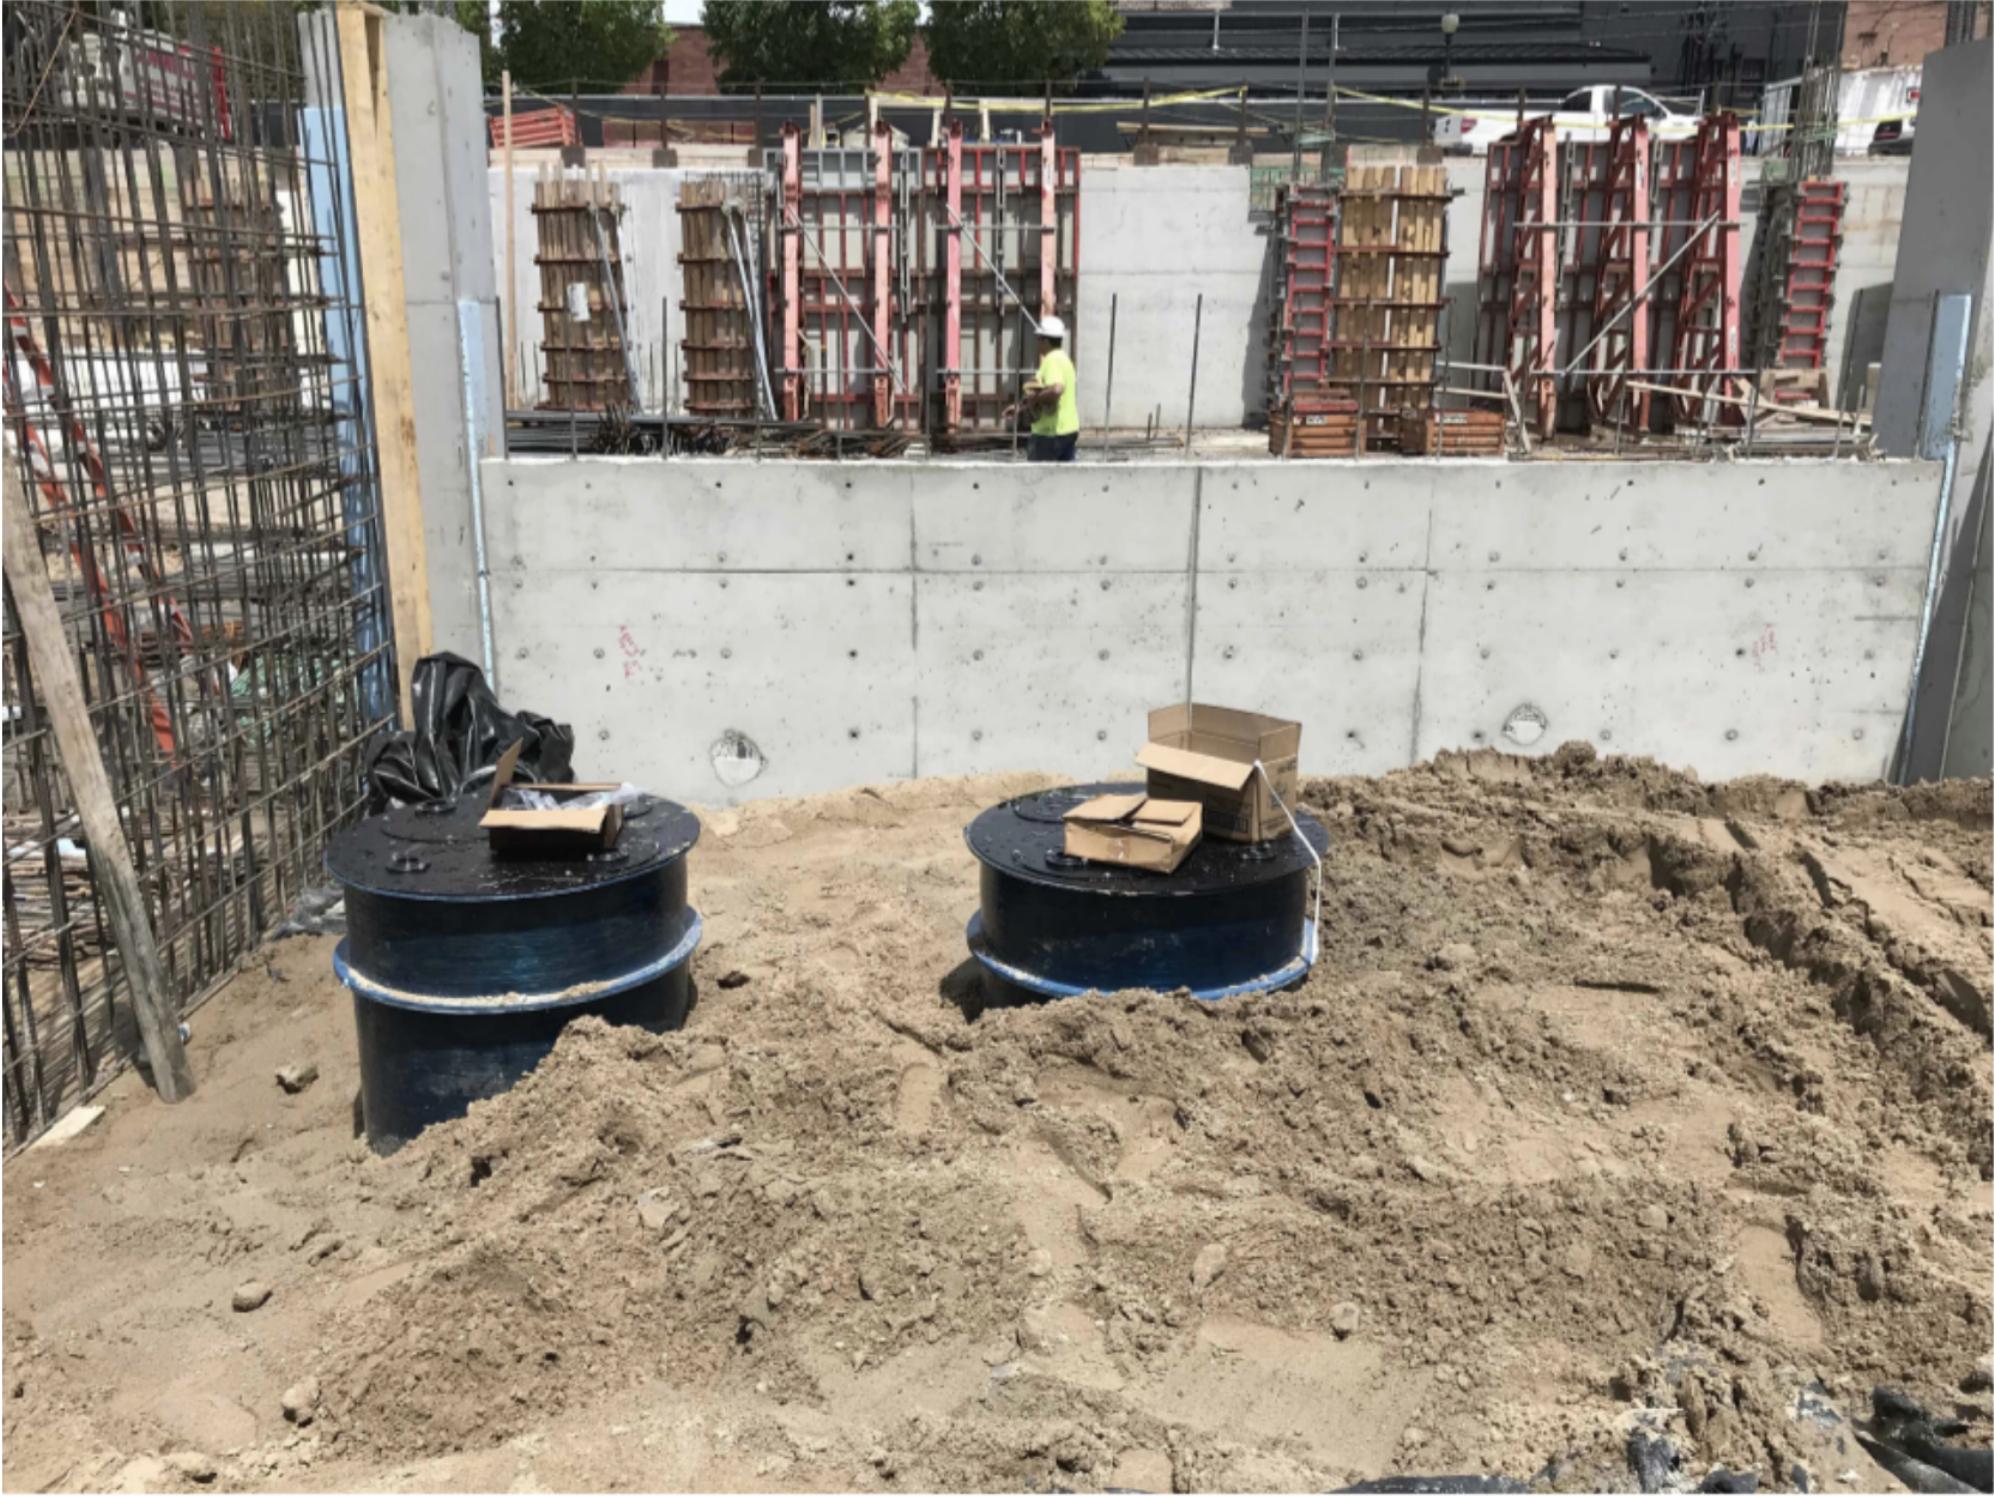 Installation of sump basins in storage room